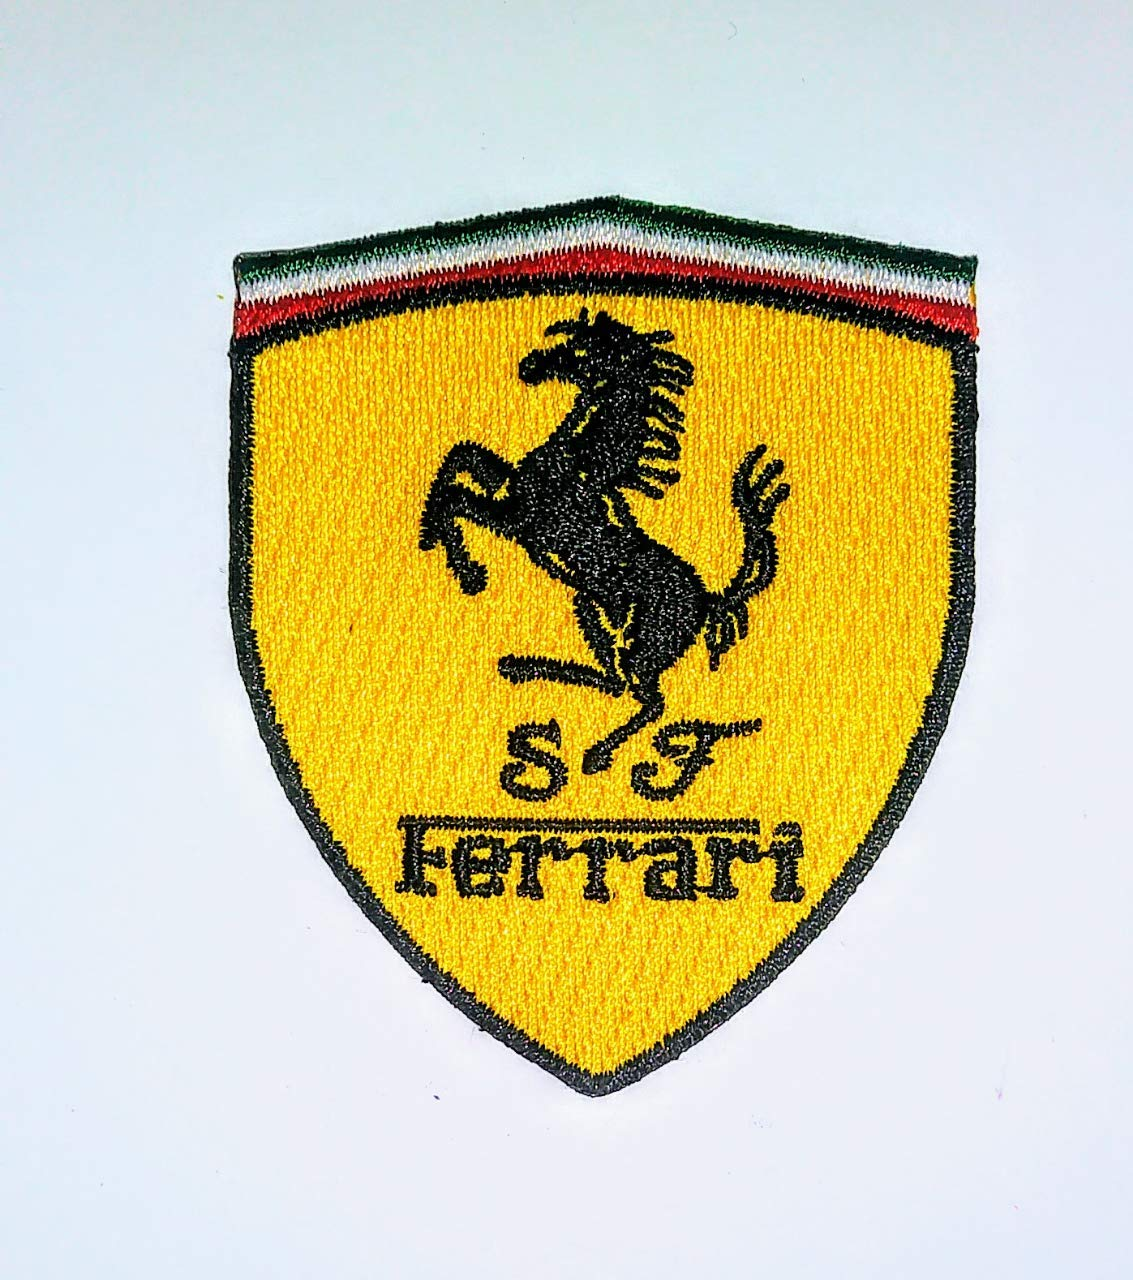 Ferrari Embroidered Iron On Automotive Patch.